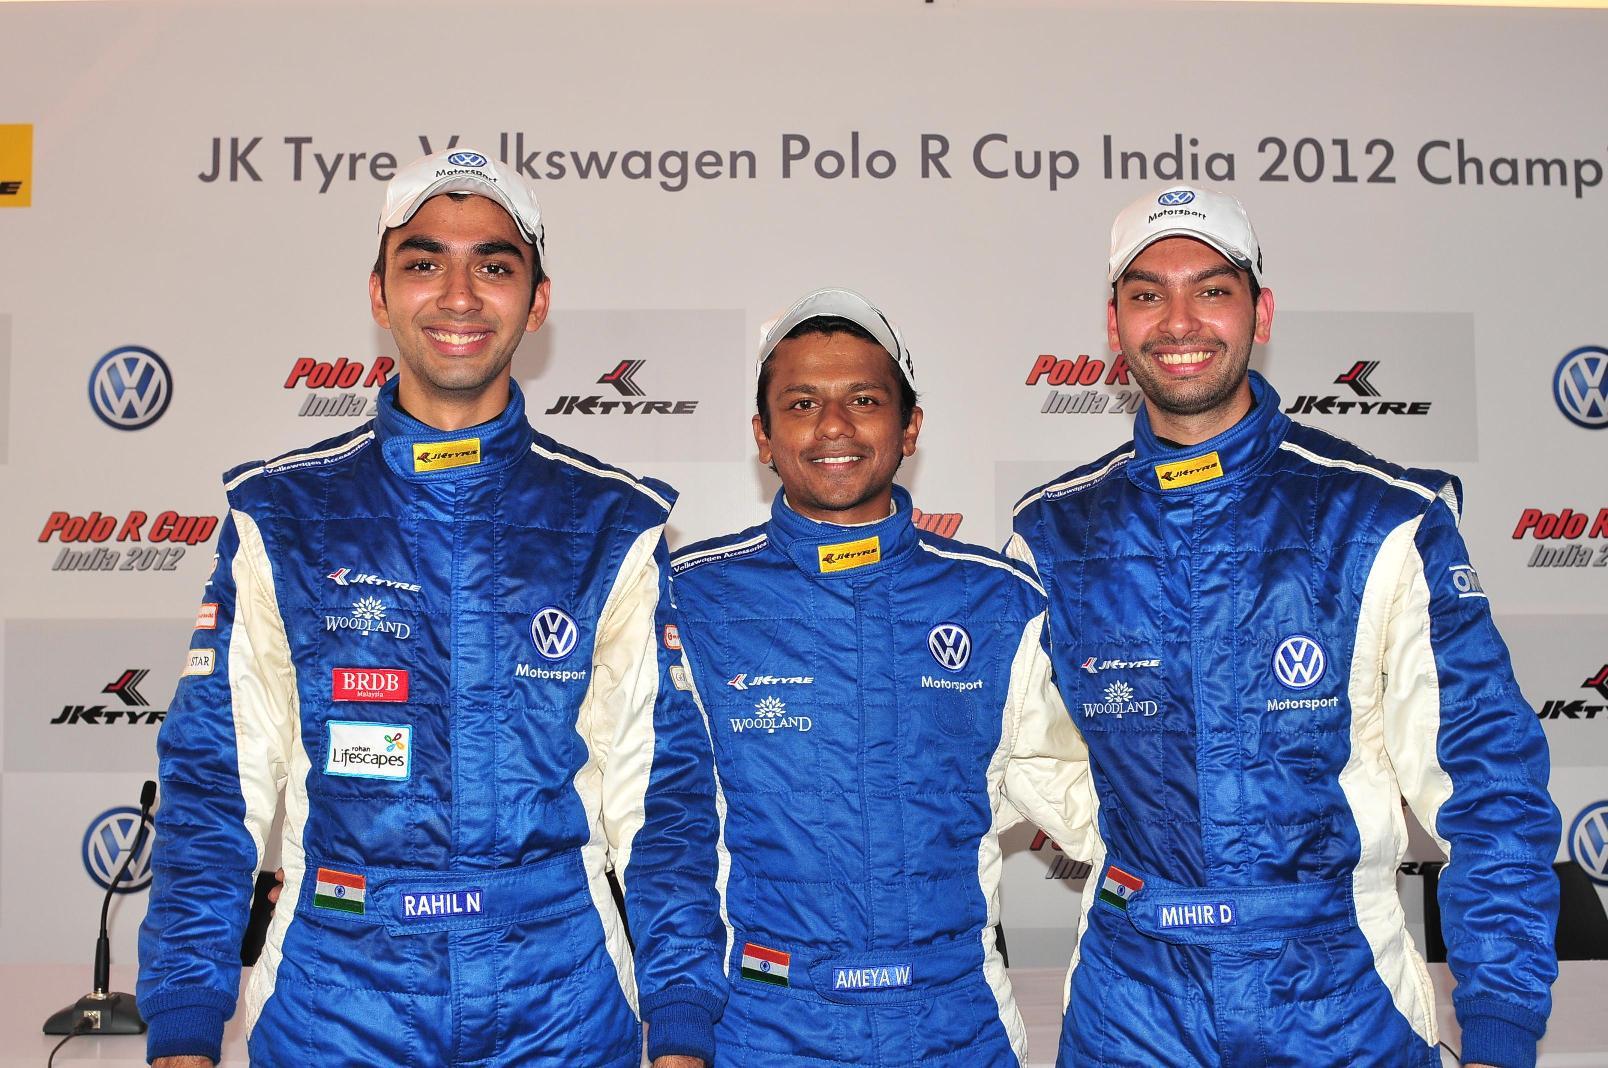 3 Winners Race 1 -L to R- Rahil Noorani Ameya Walavalkar Mihir Dharkar